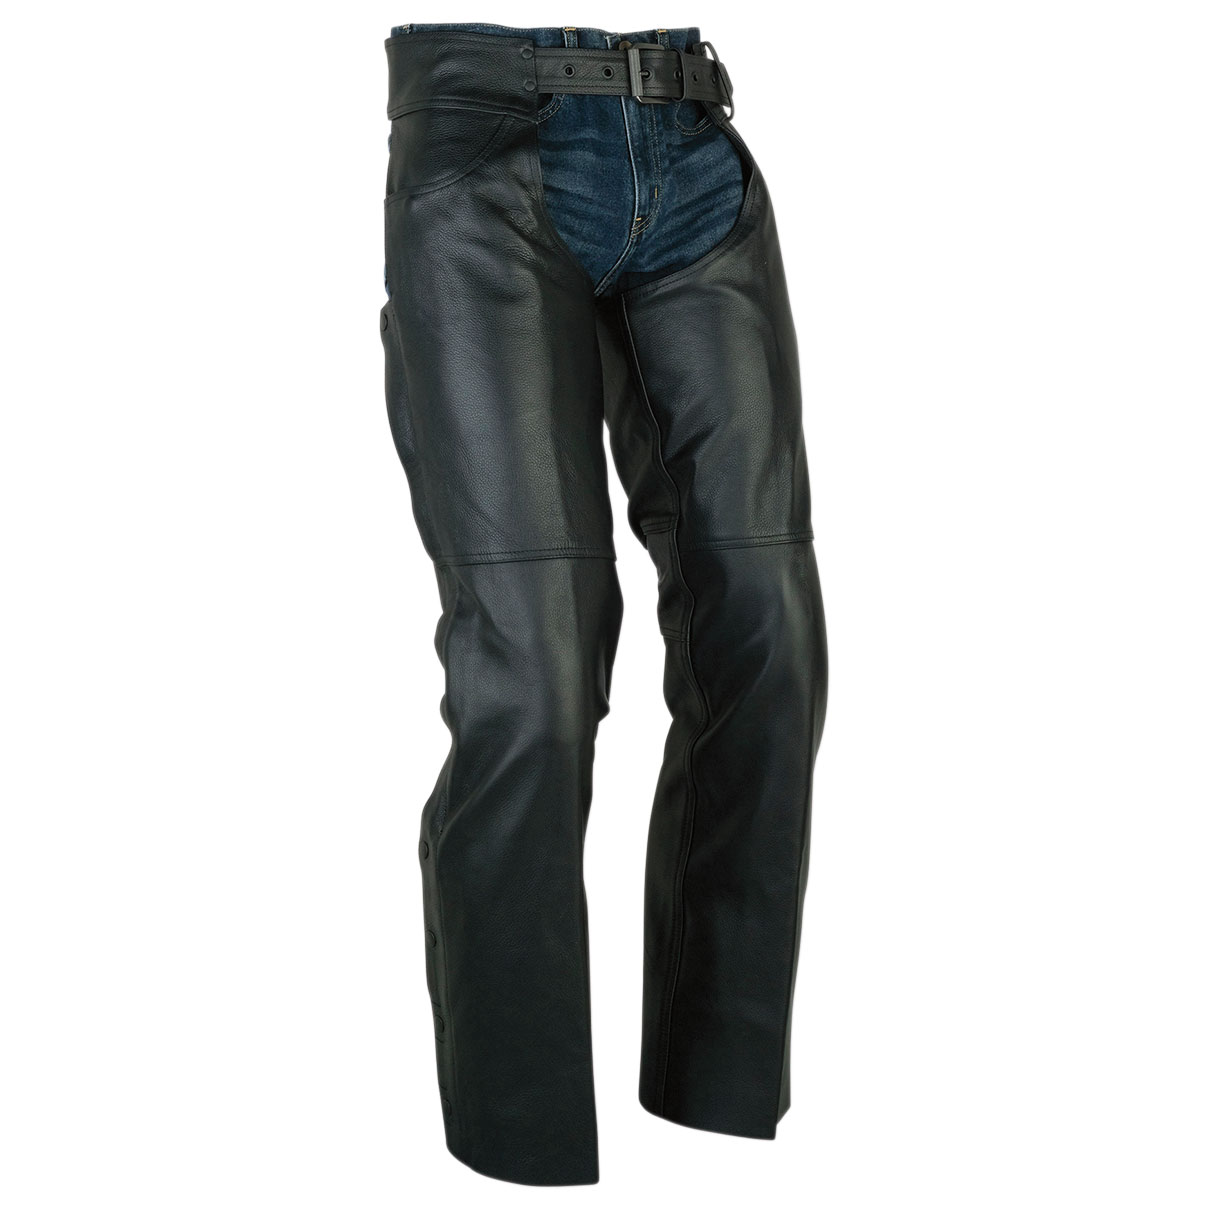 Z1R Men's Sabot Black Leather Chaps